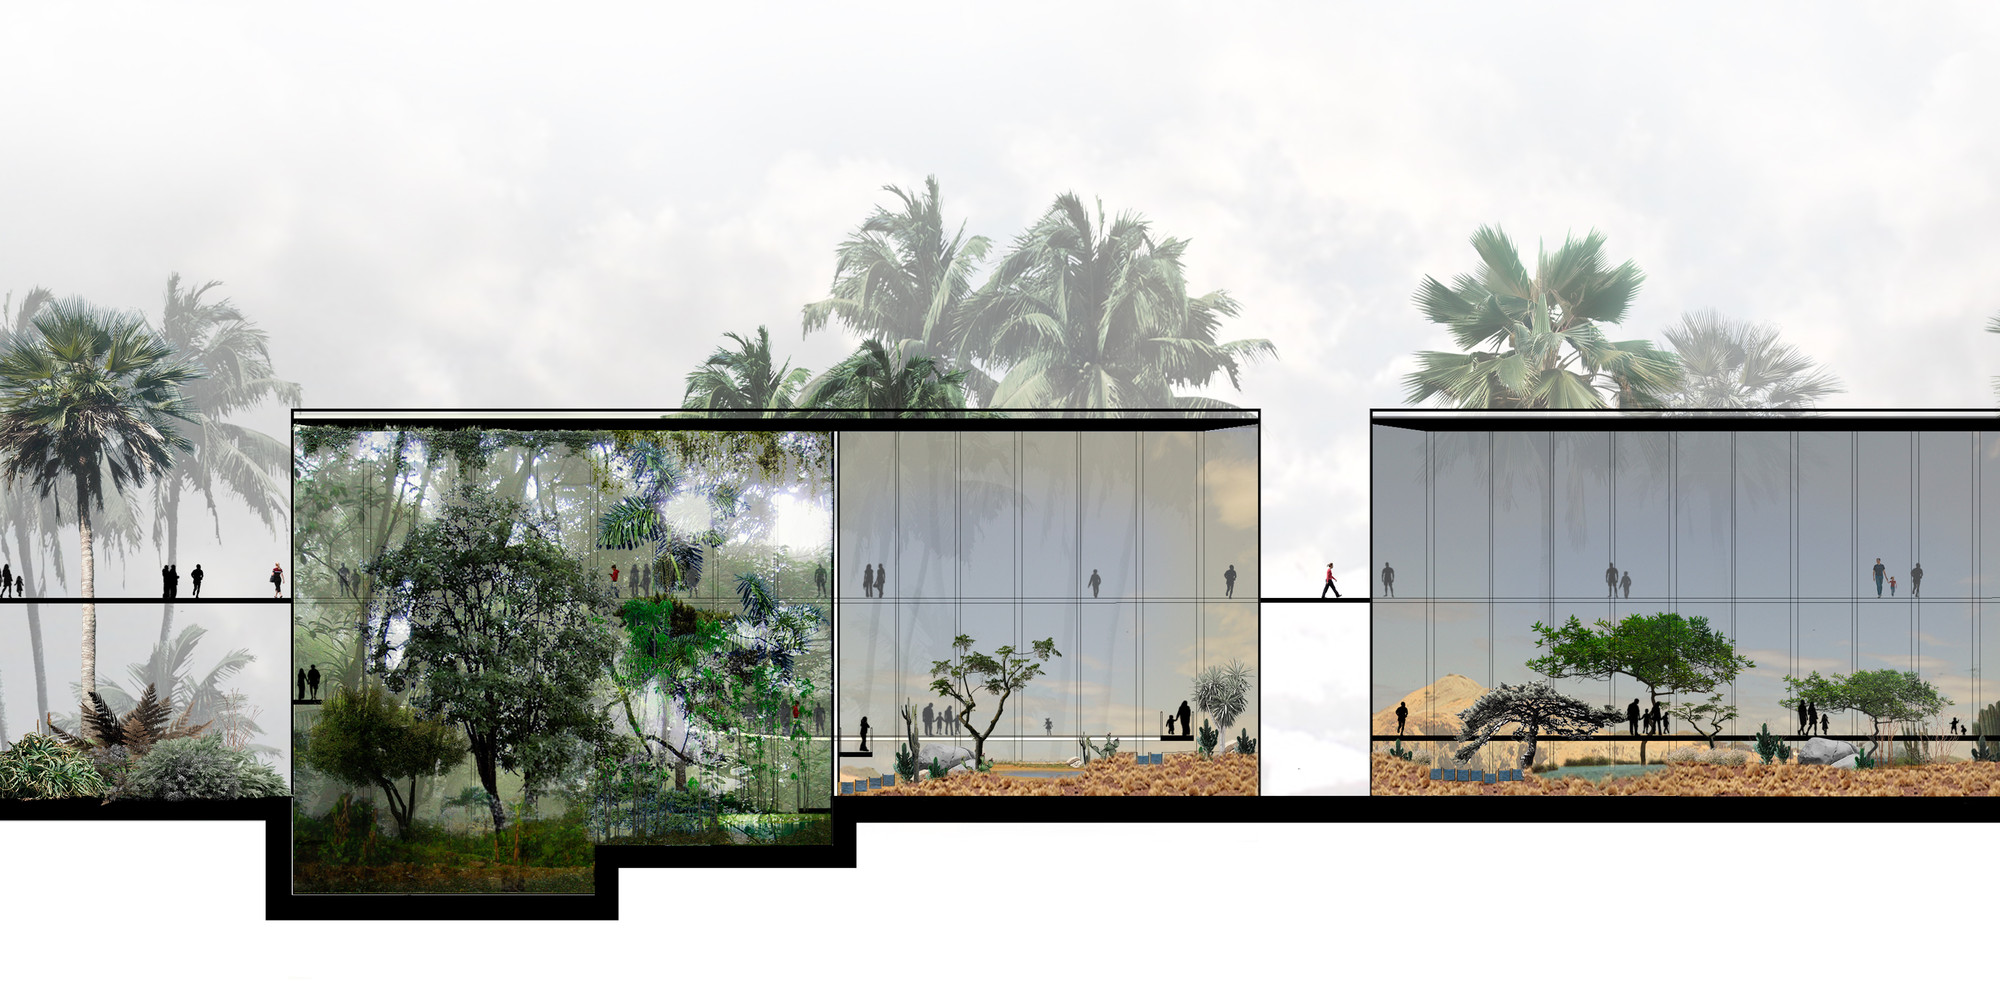 Galer a de segundo lugar en concurso p blico para el Centro de eventos jardin botanico